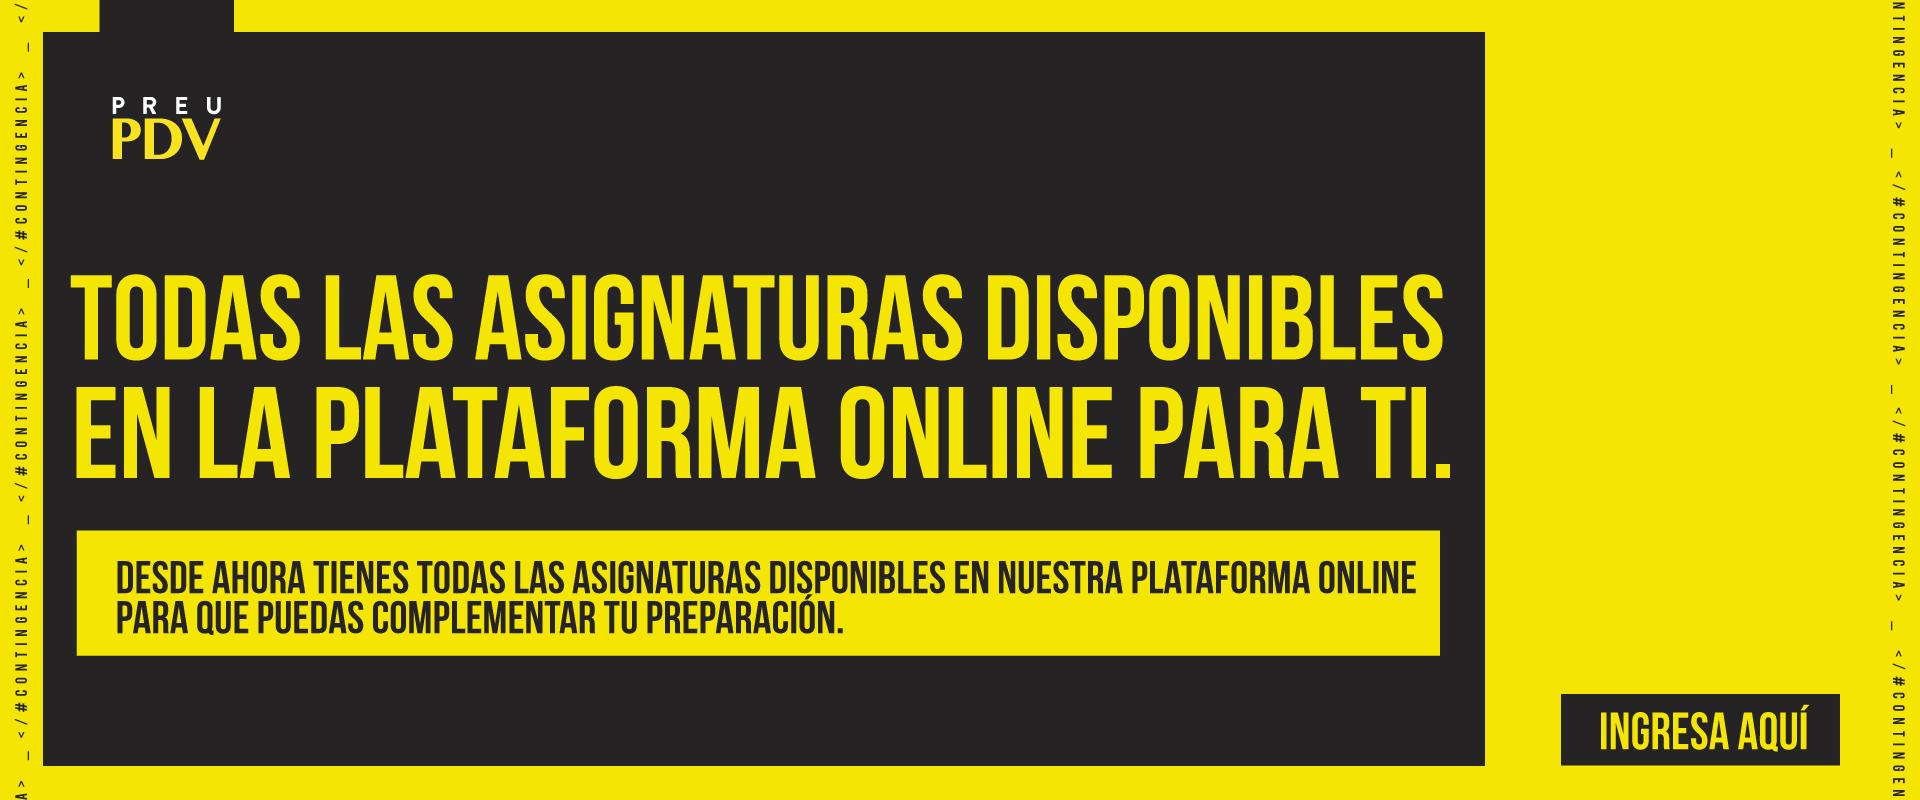 PDV Online para todos